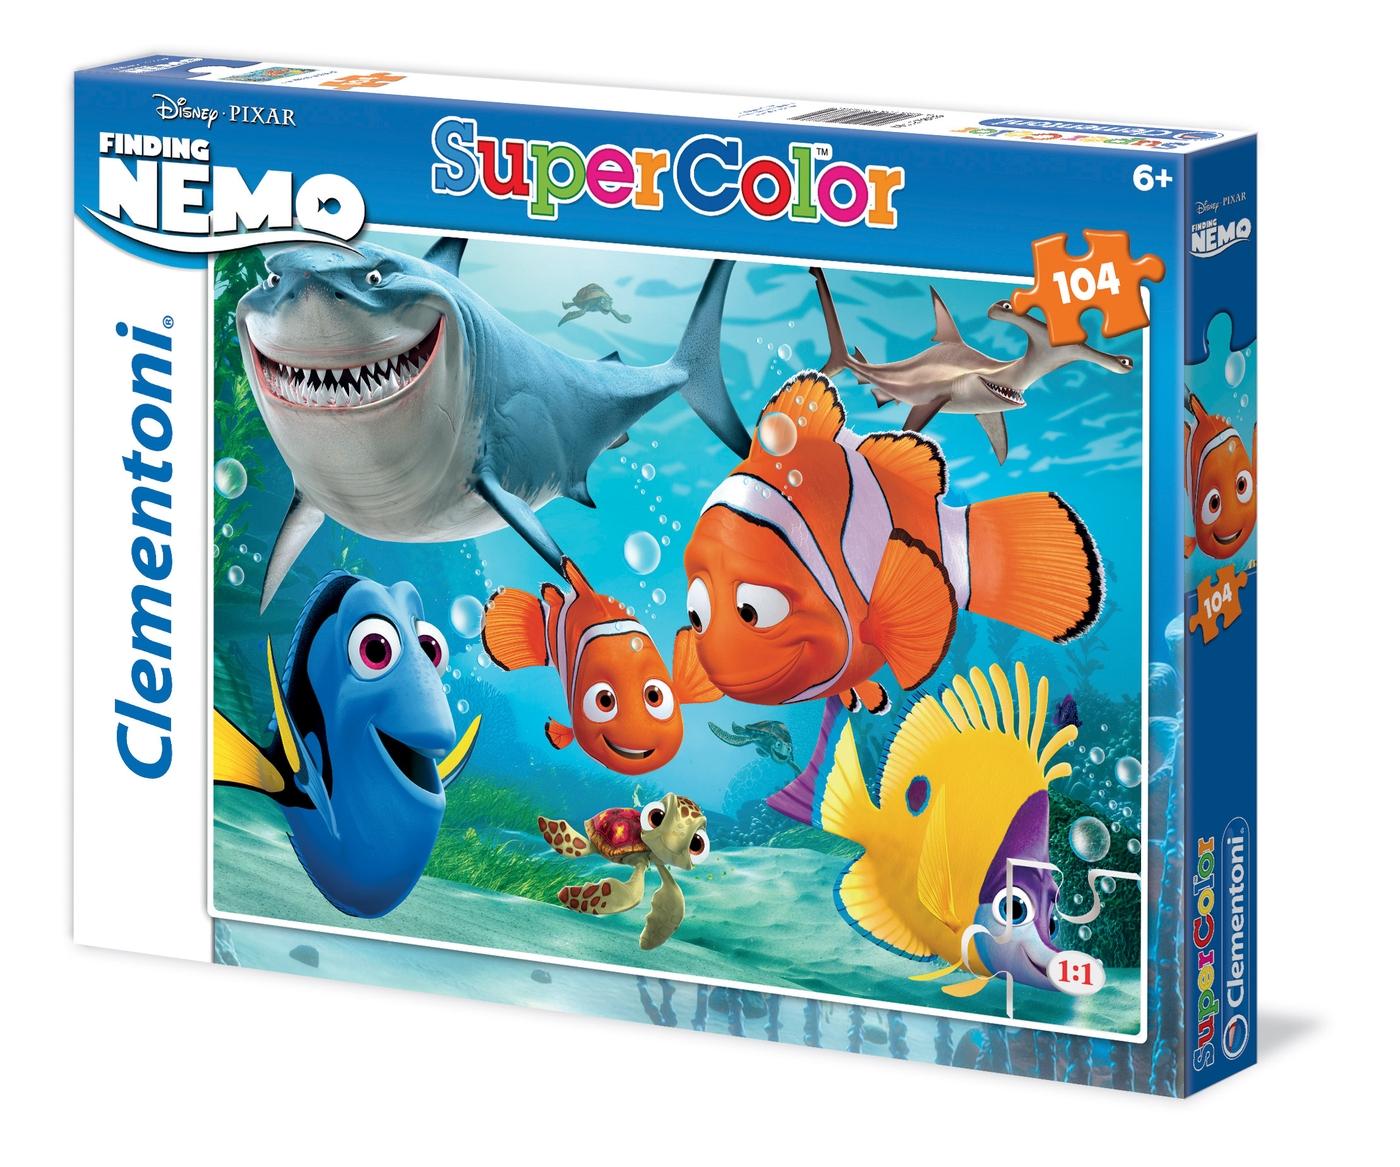 Пазлы Clementoni/Nemo арт.: 27886 (104 эл.)